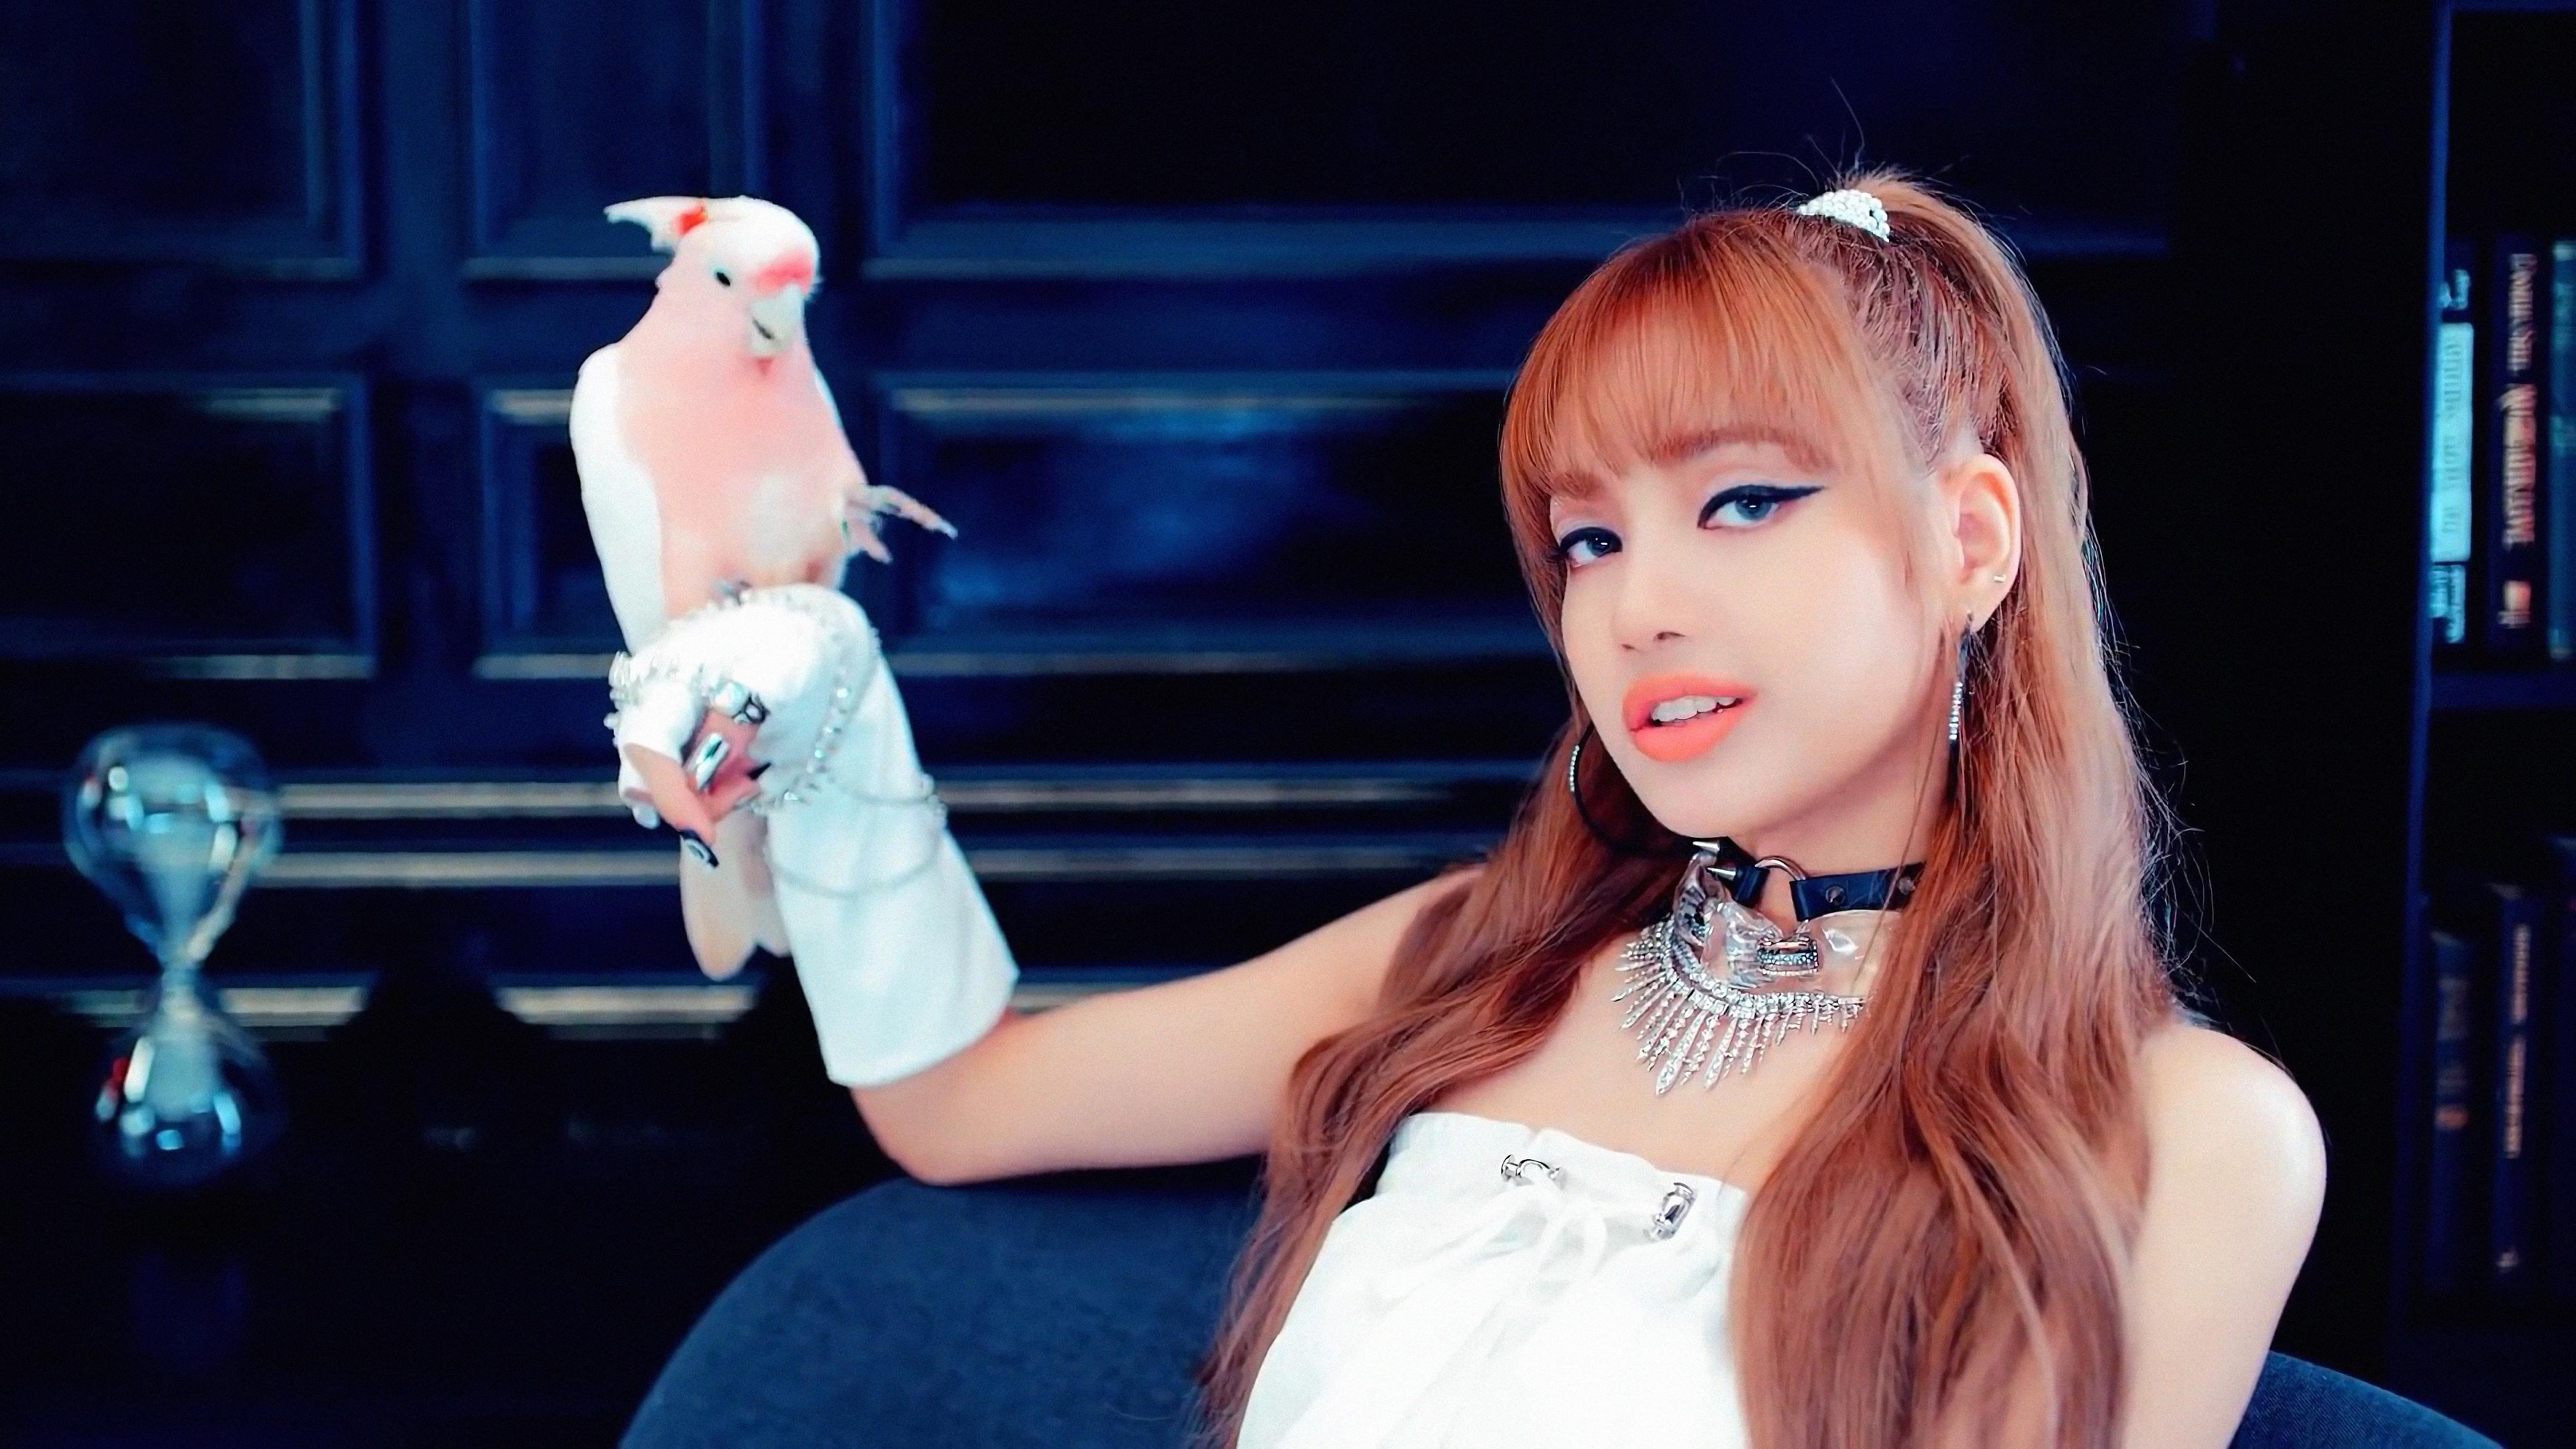 Korean Girl Wallpapers Apk Blackpink Lisa Wallpaper Pc 187 Hd Images Wallpaper For